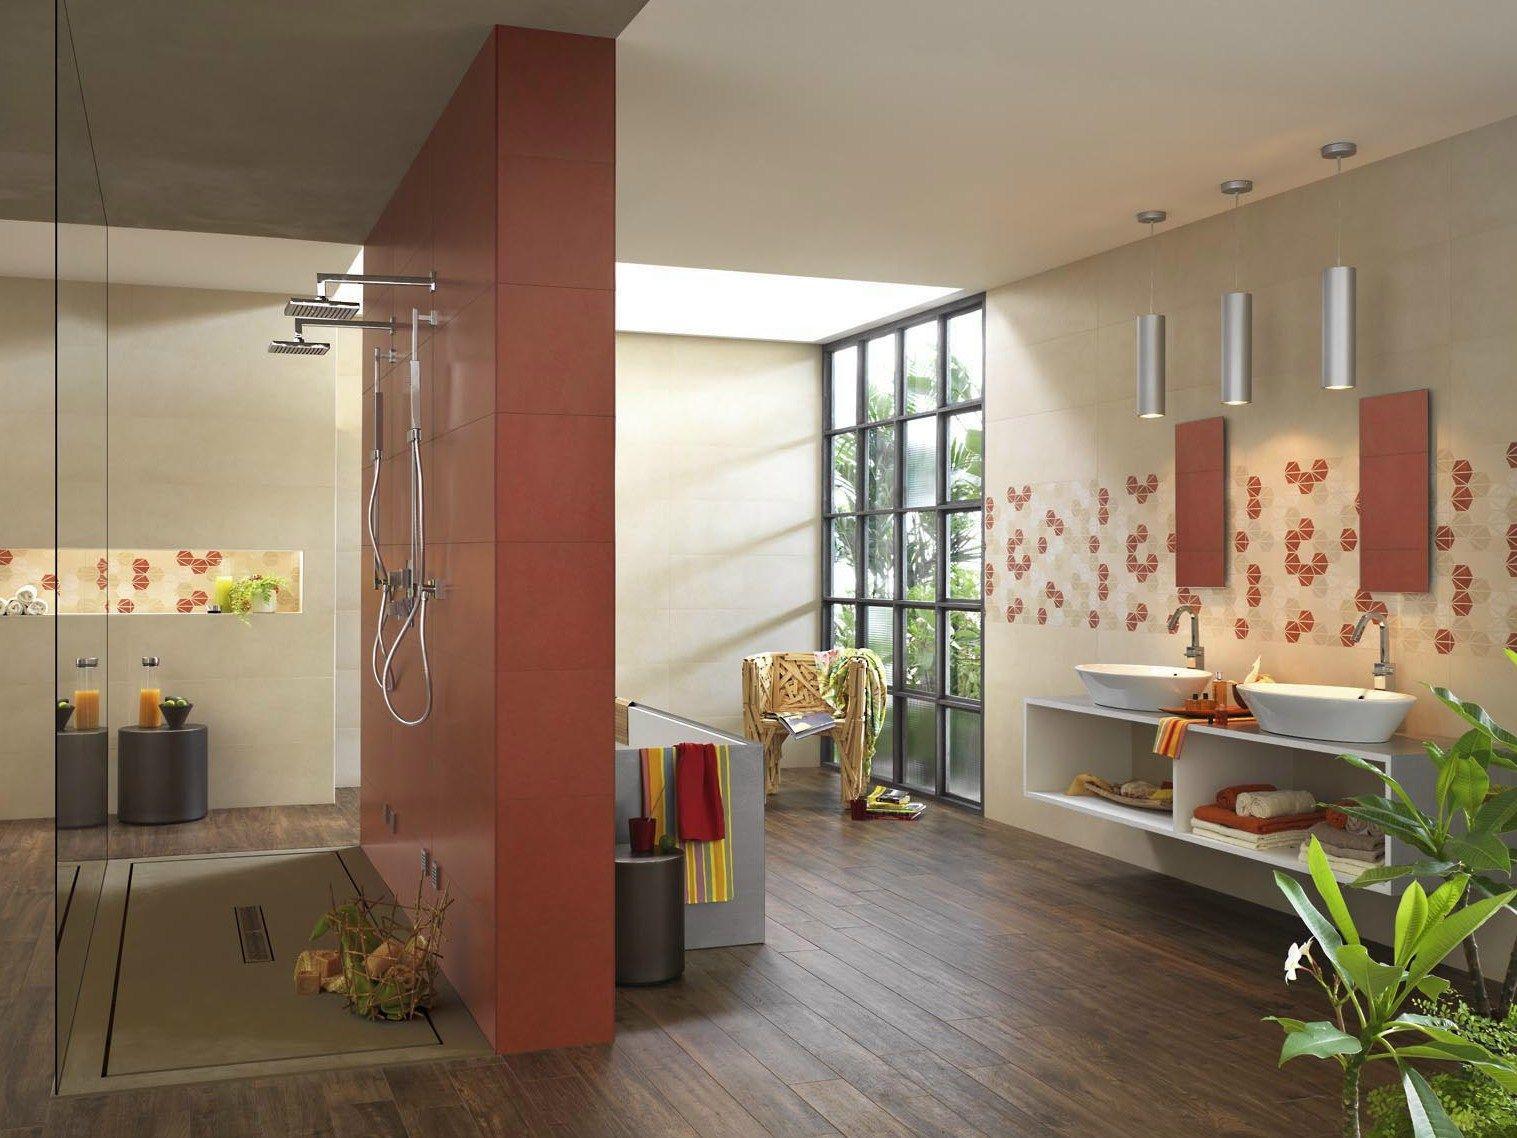 Revestimiento de pared en pasta blanca para interiores oficina7 by marazzi - Catalogo piastrelle marazzi ...